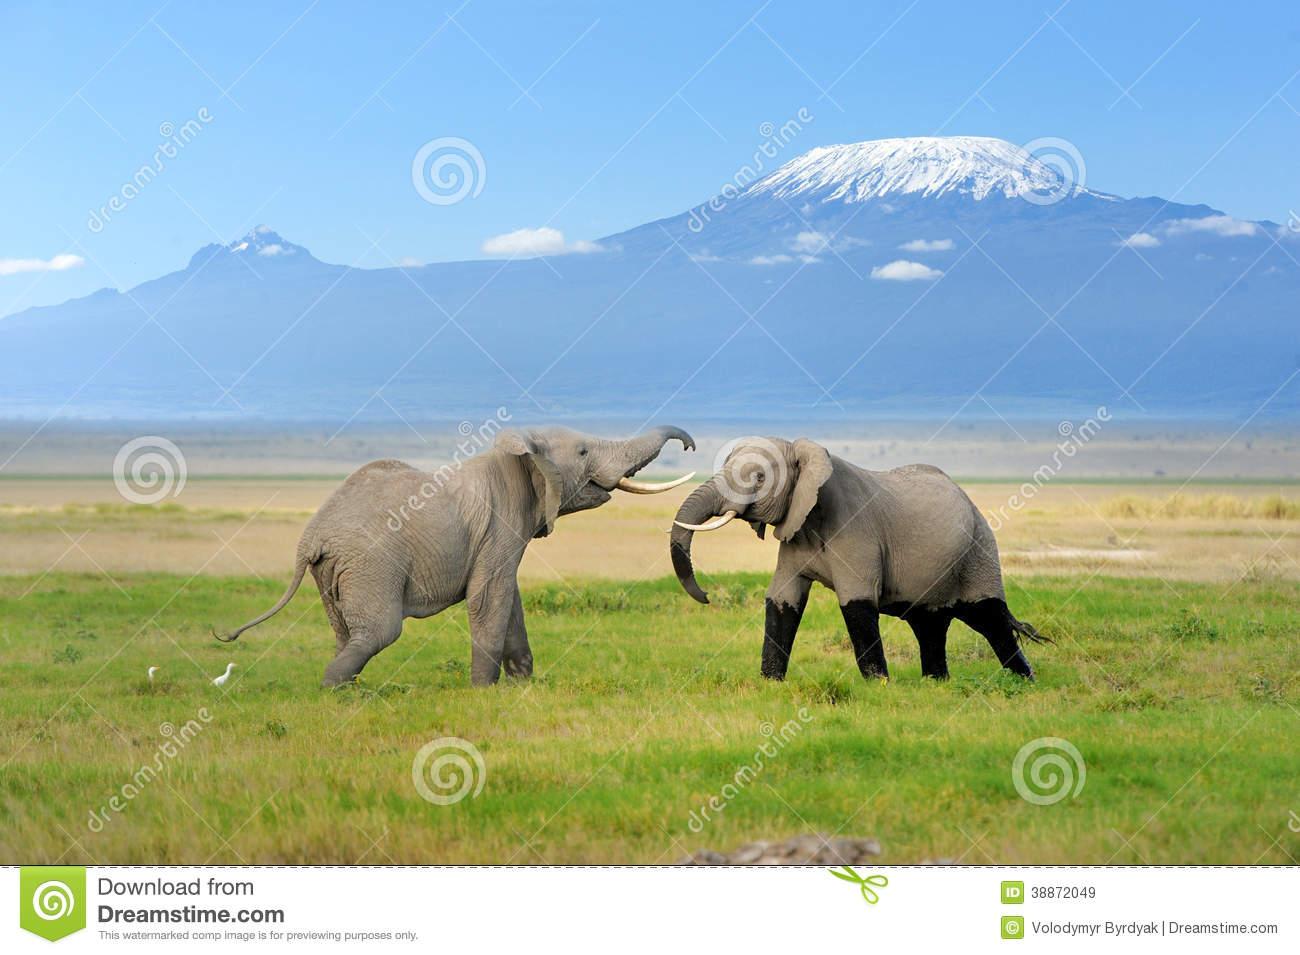 Mount Kilimanjaro clipart #2, Download drawings